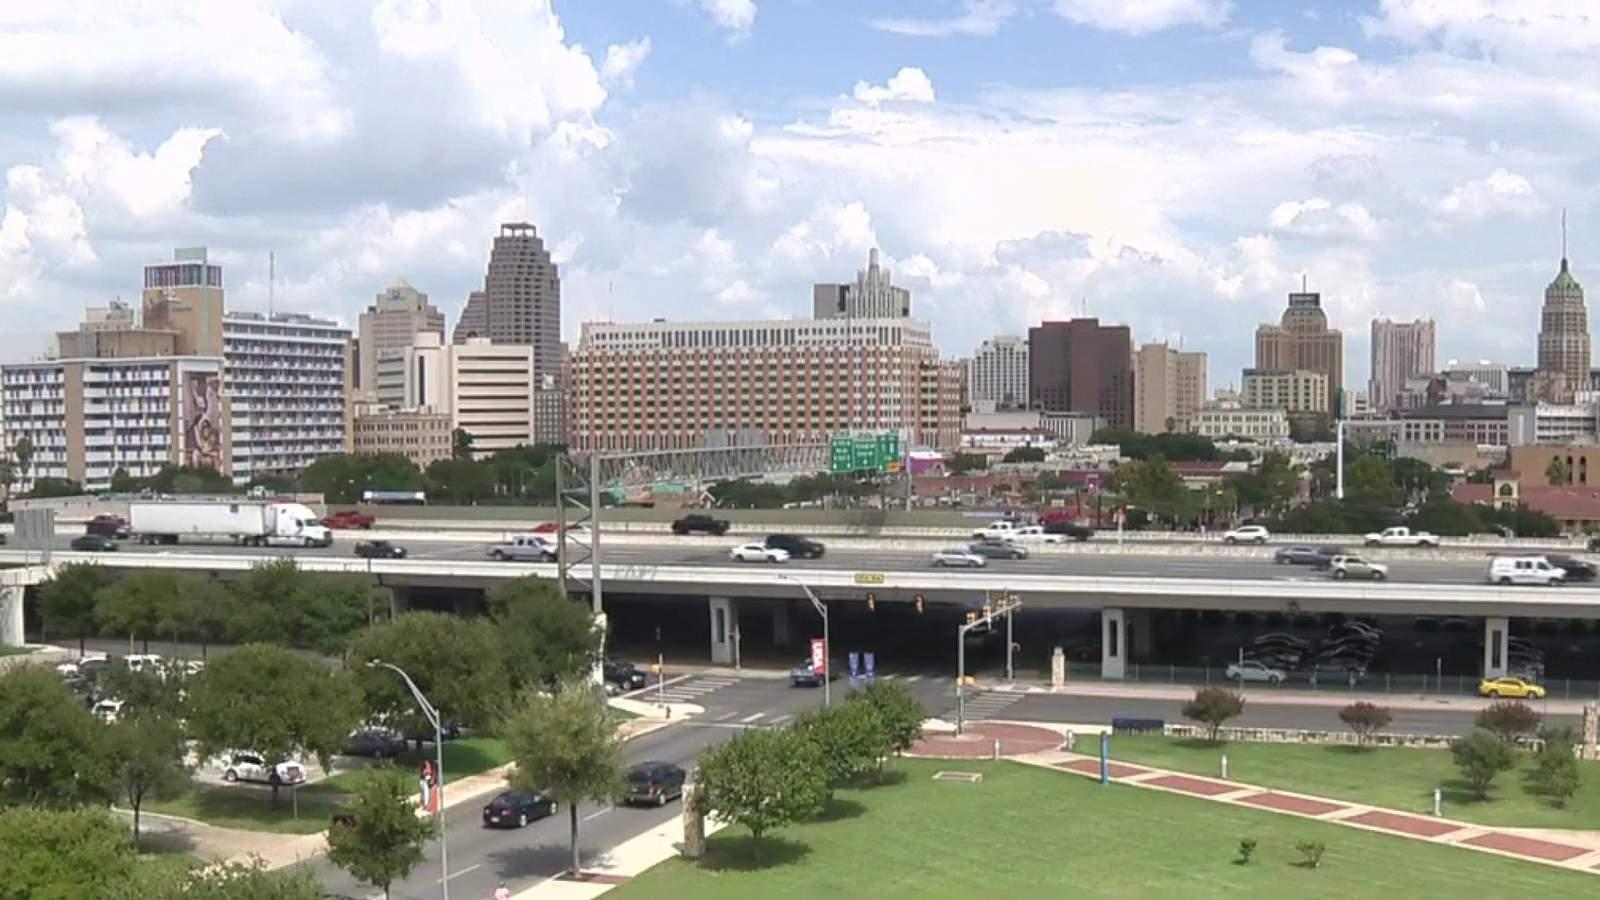 Coronavirus update San Antonio, Feb. 27: Officials report 482 new COVID-19 cases, no new deaths - KSAT San Antonio